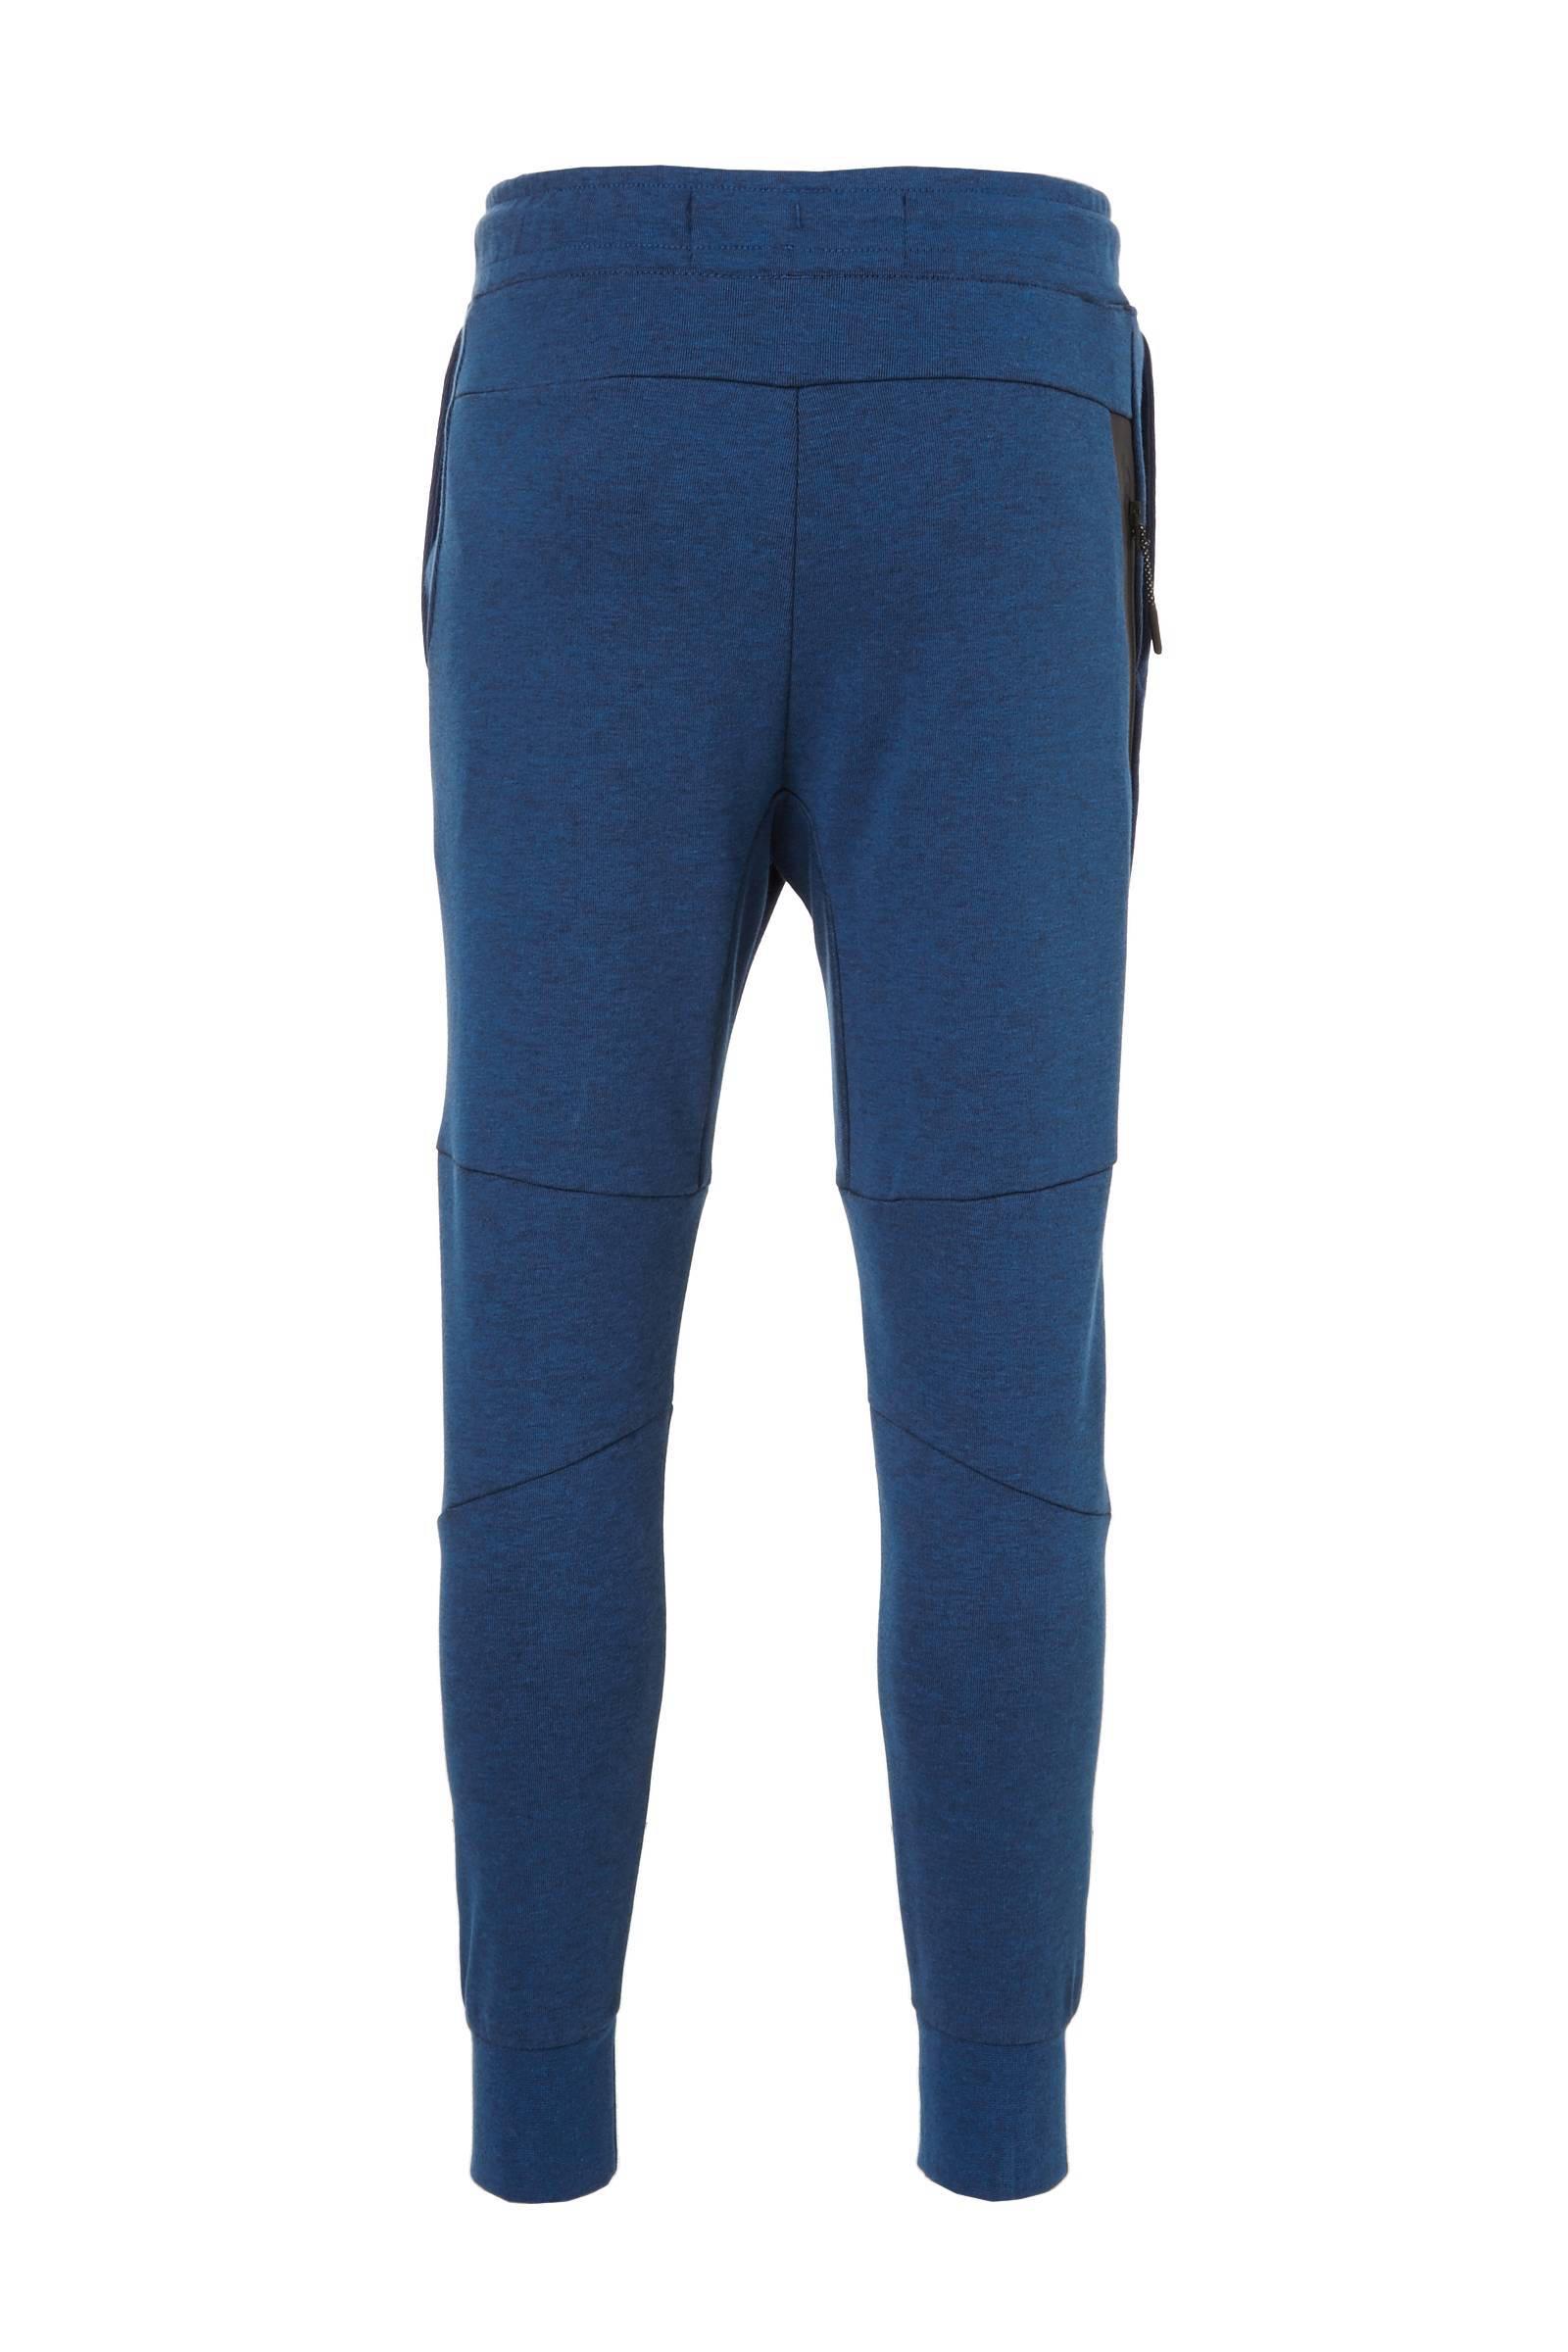 eedb9e9e847 Nike Tech Fleece joggingbroek | wehkamp